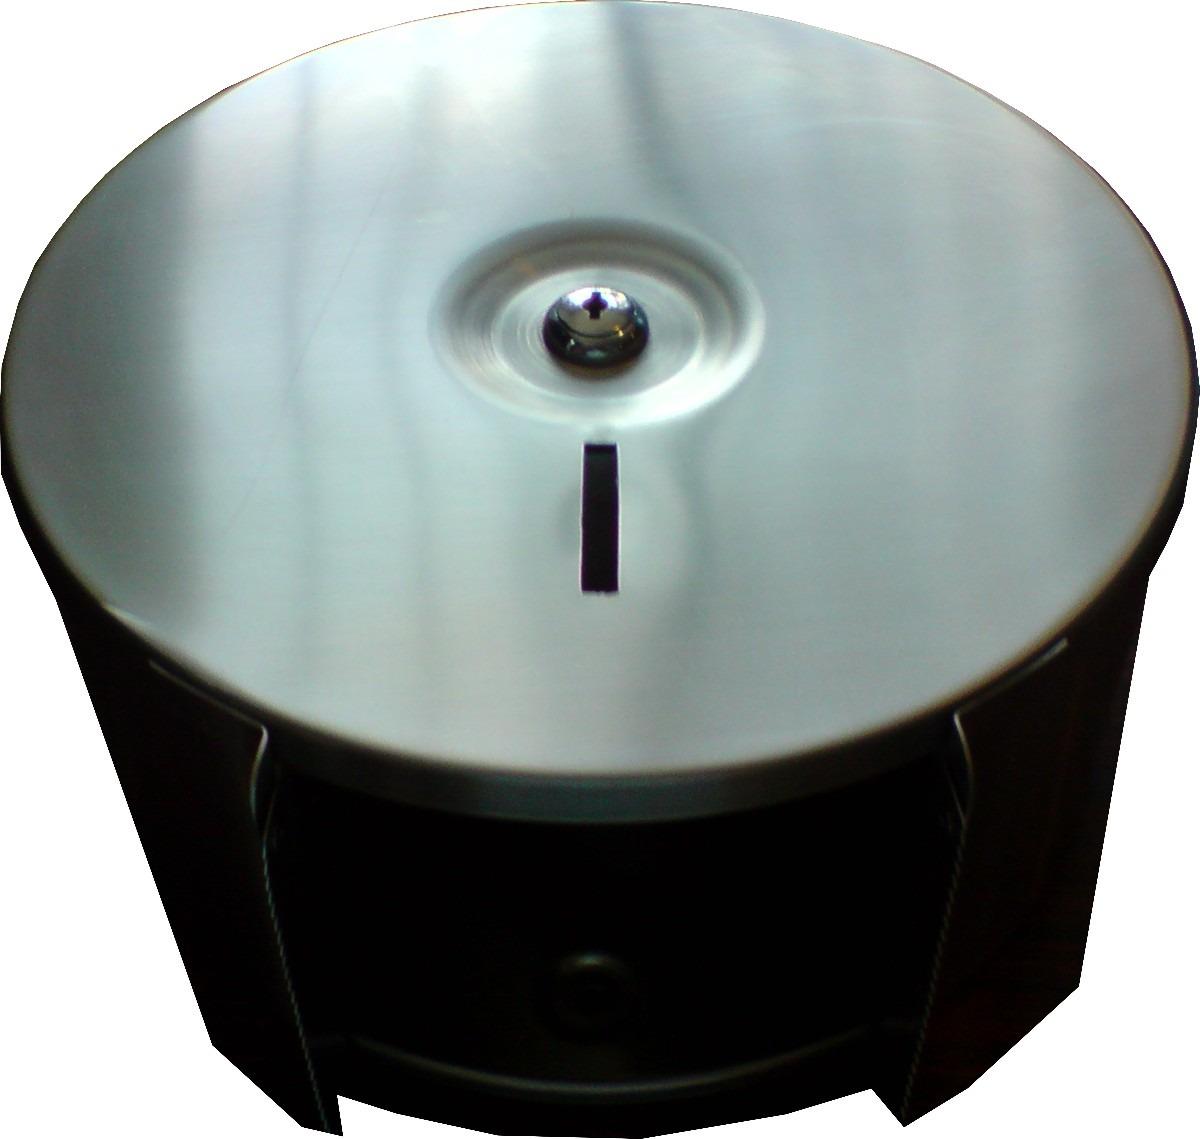 Dispensador de papel higienico 9 pulgadas acero inoxidable for Accesorios para bano papel higienico